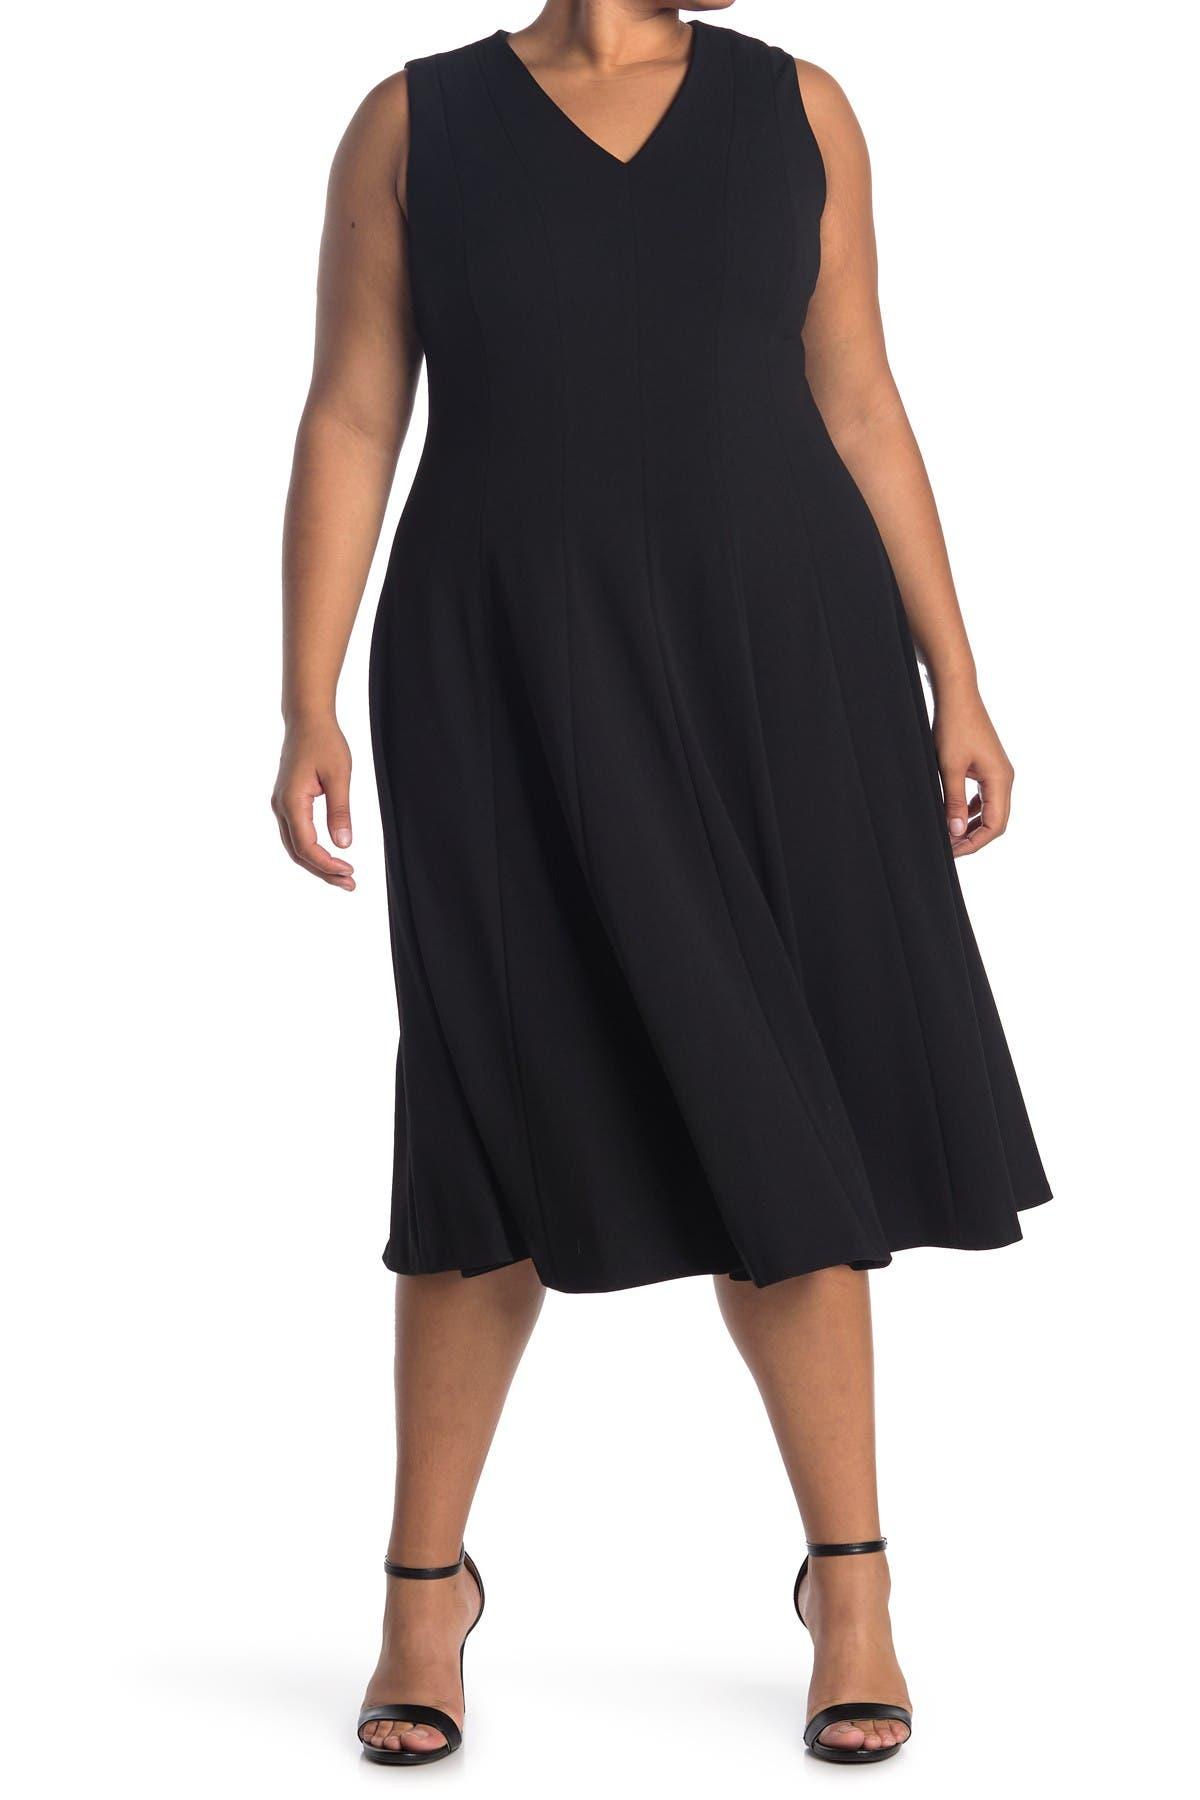 Image of Calvin Klein Sleeveless Fit & Flare Midi Dress